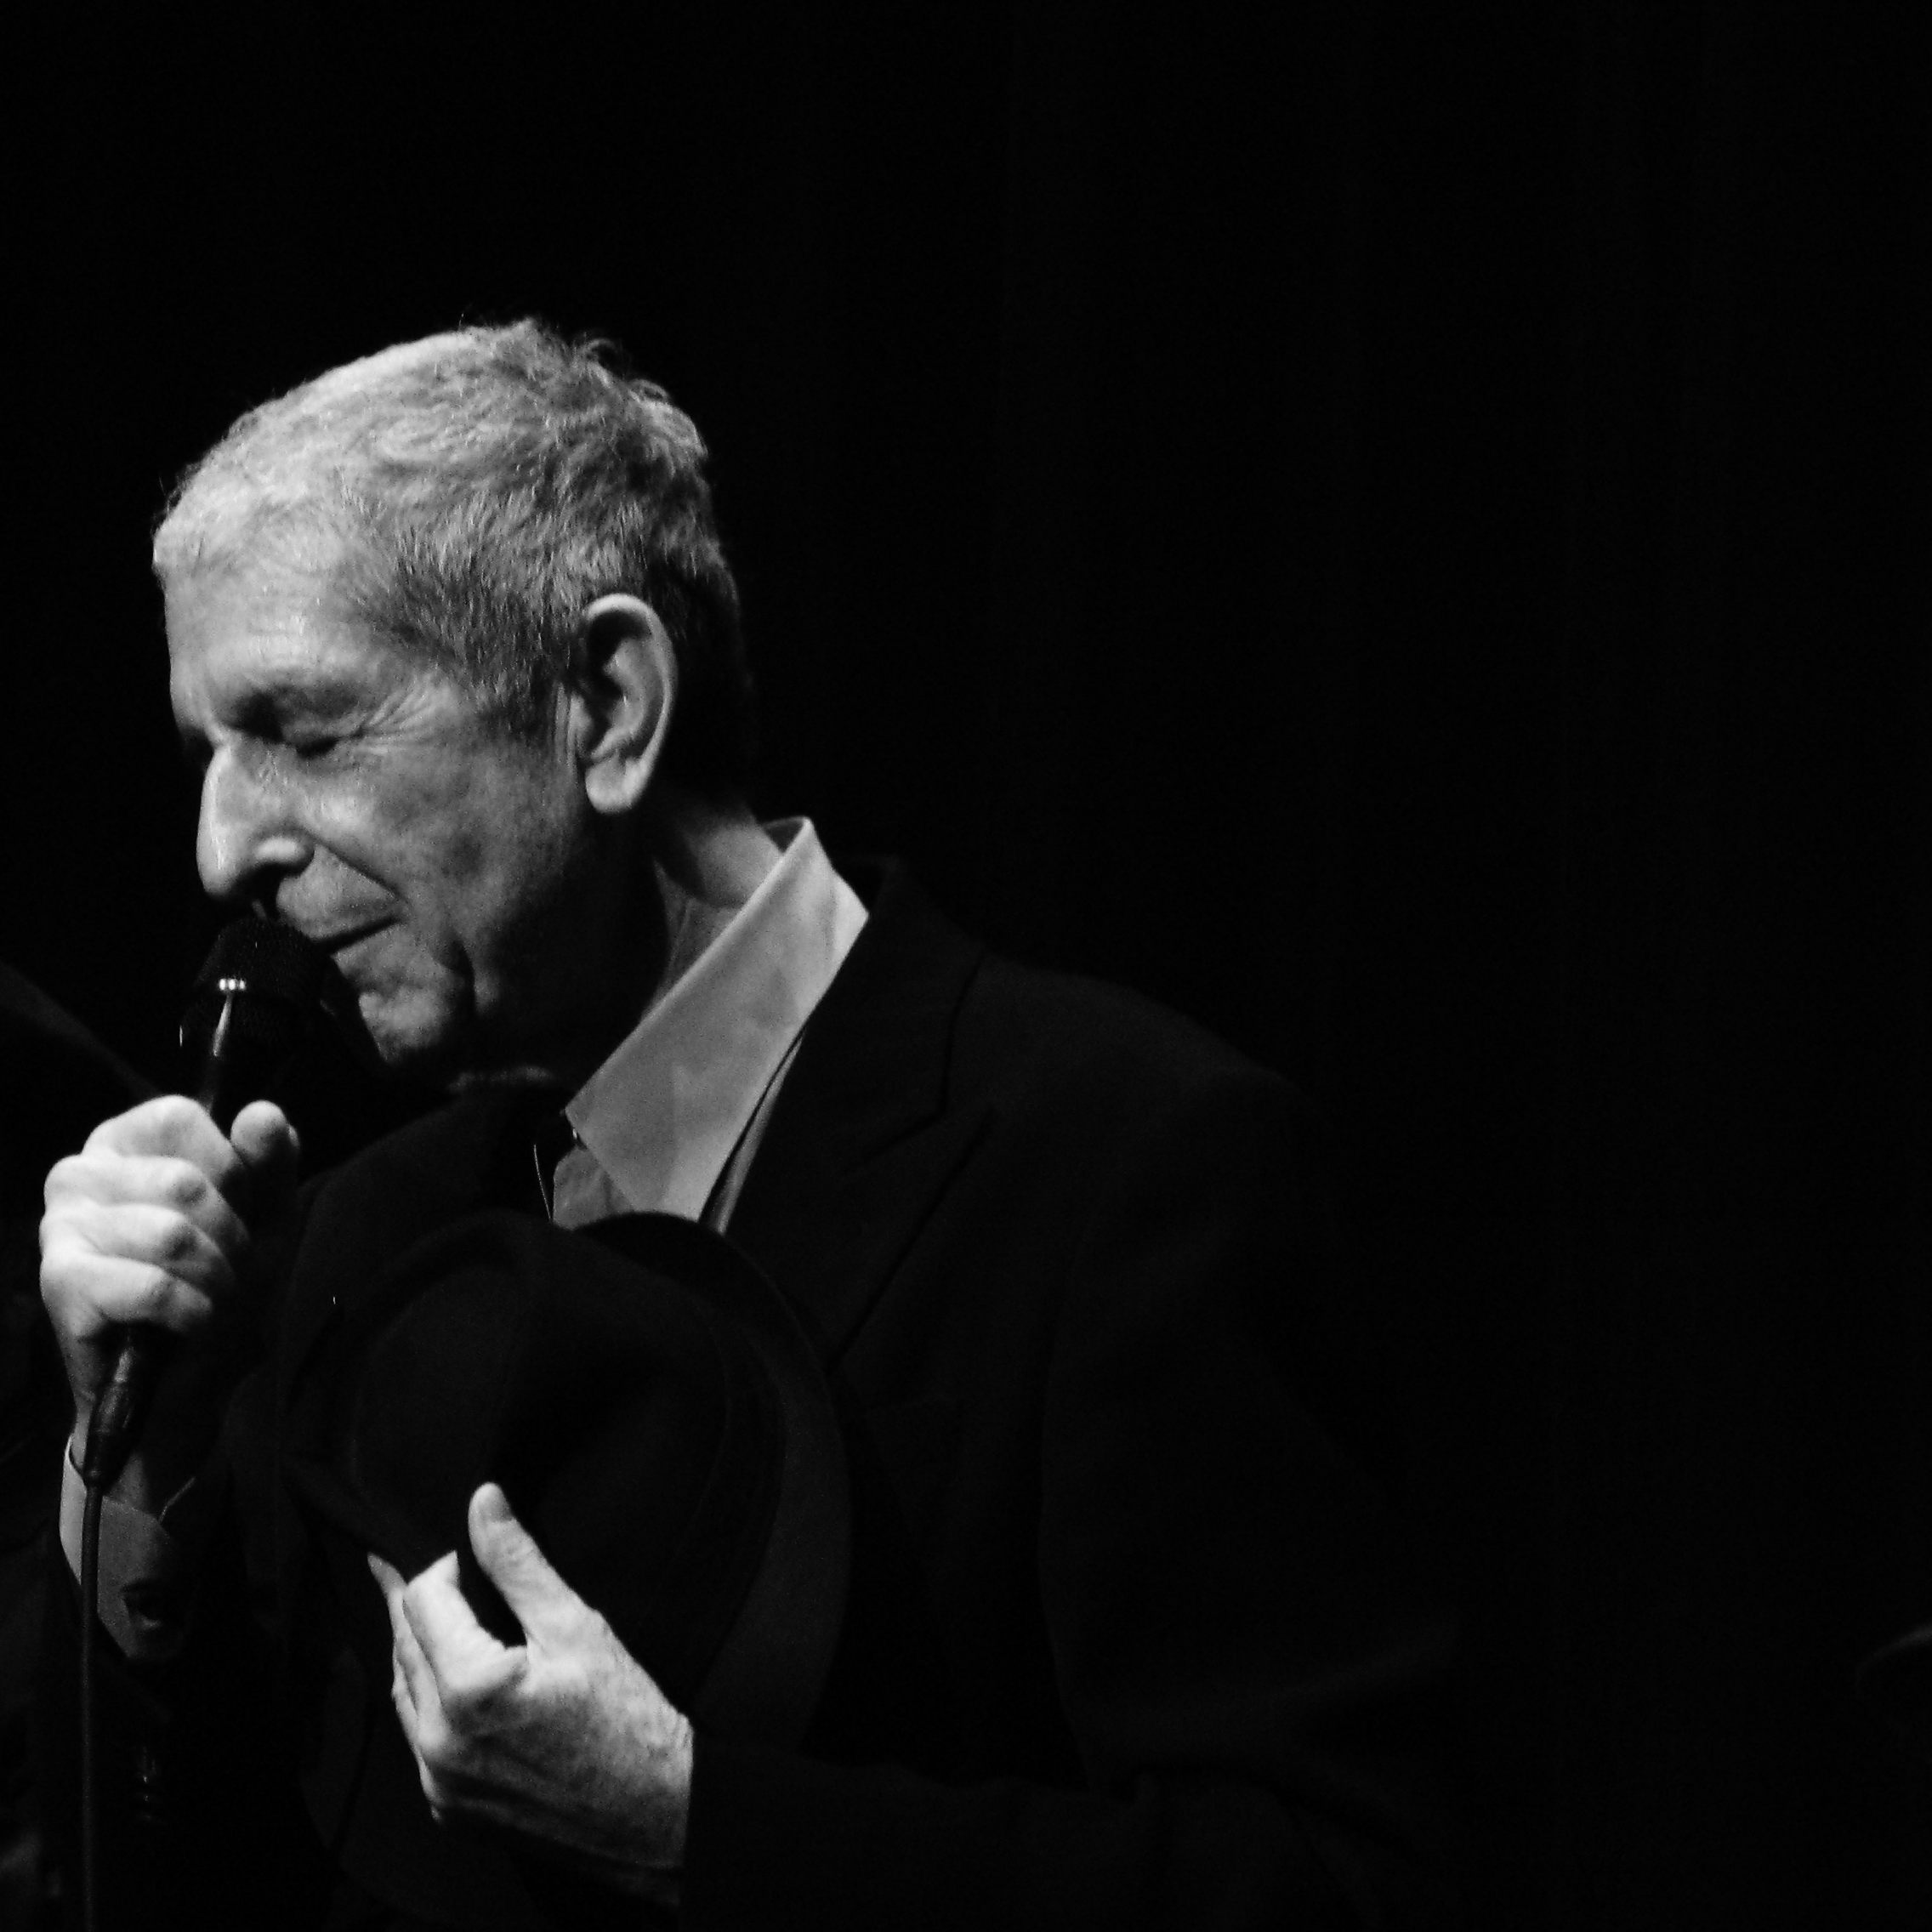 Sydney Recording Studio Leonard Cohen